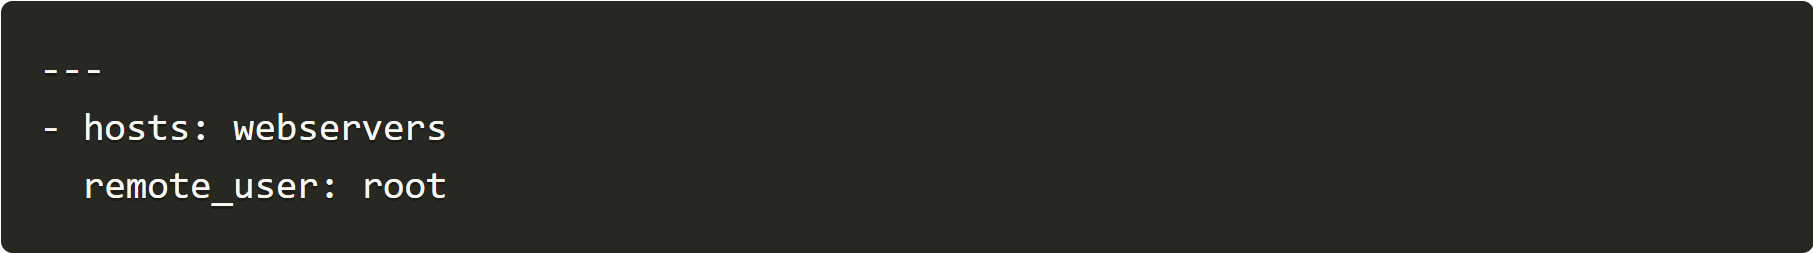 hosts webservers remote_user root